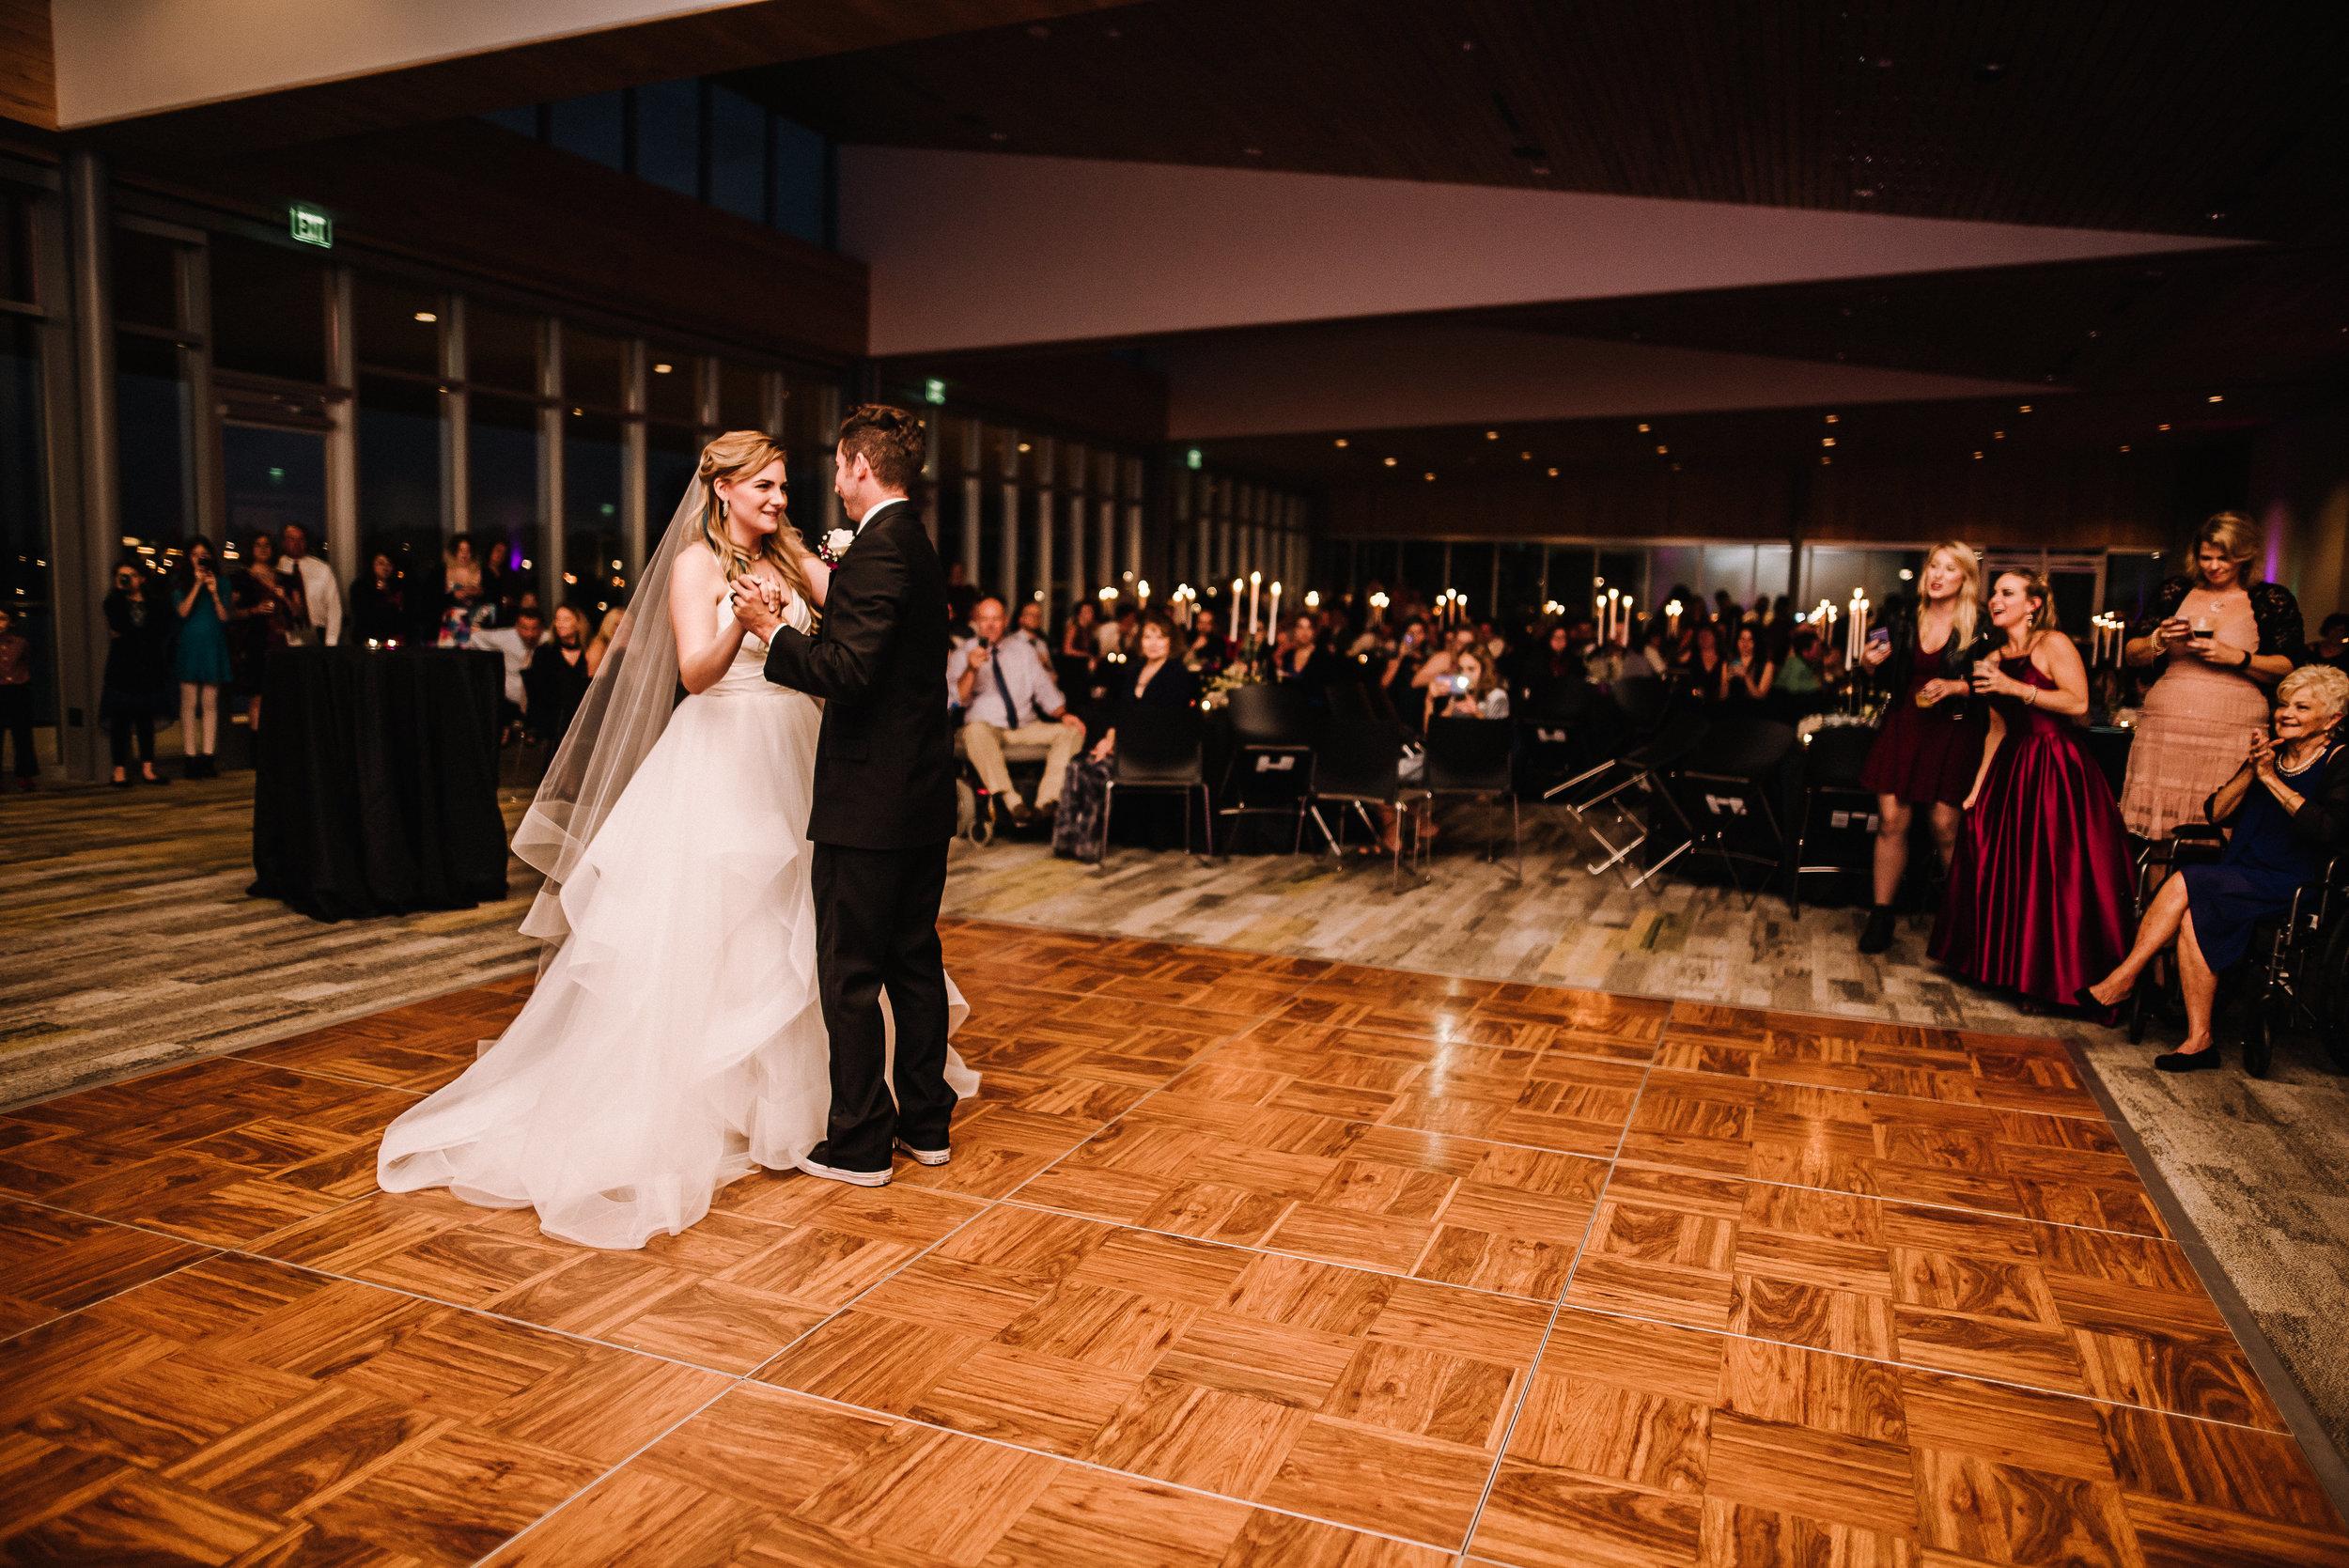 Lucchesi-Wedding_Shelby-Farms_Ashley-Benham-Photography-796.jpg